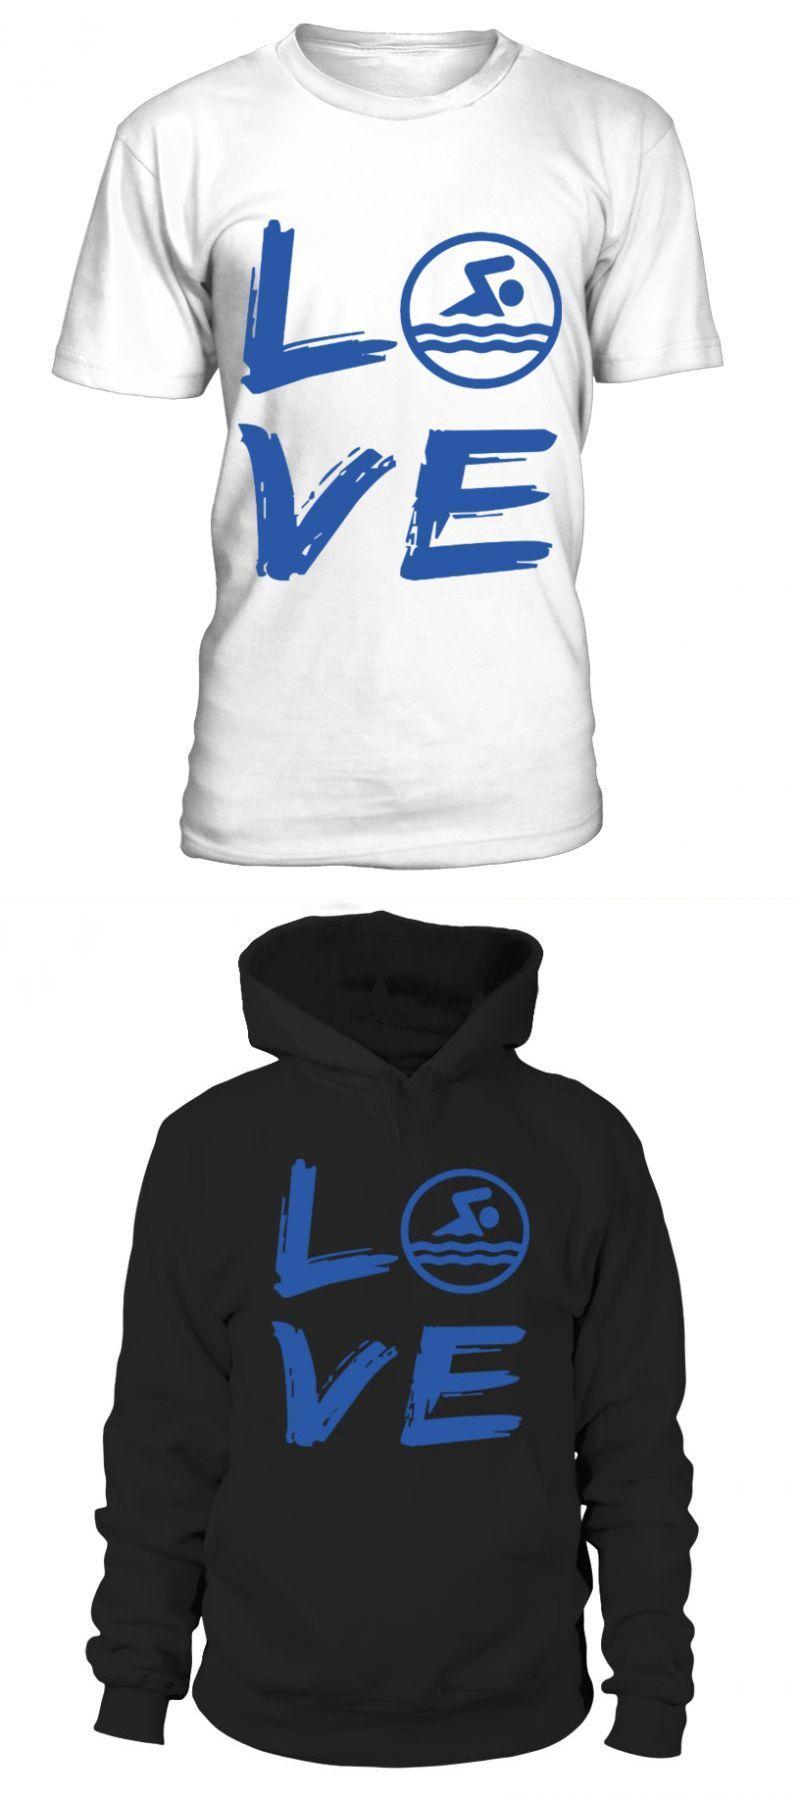 Volleyball Grandma T Shirt Swimming Love Japanese Volleyball T Shirt Volleyball Grand Volleyball T Shirt Designs Volleyball Tshirts Volleyball Tshirt Designs